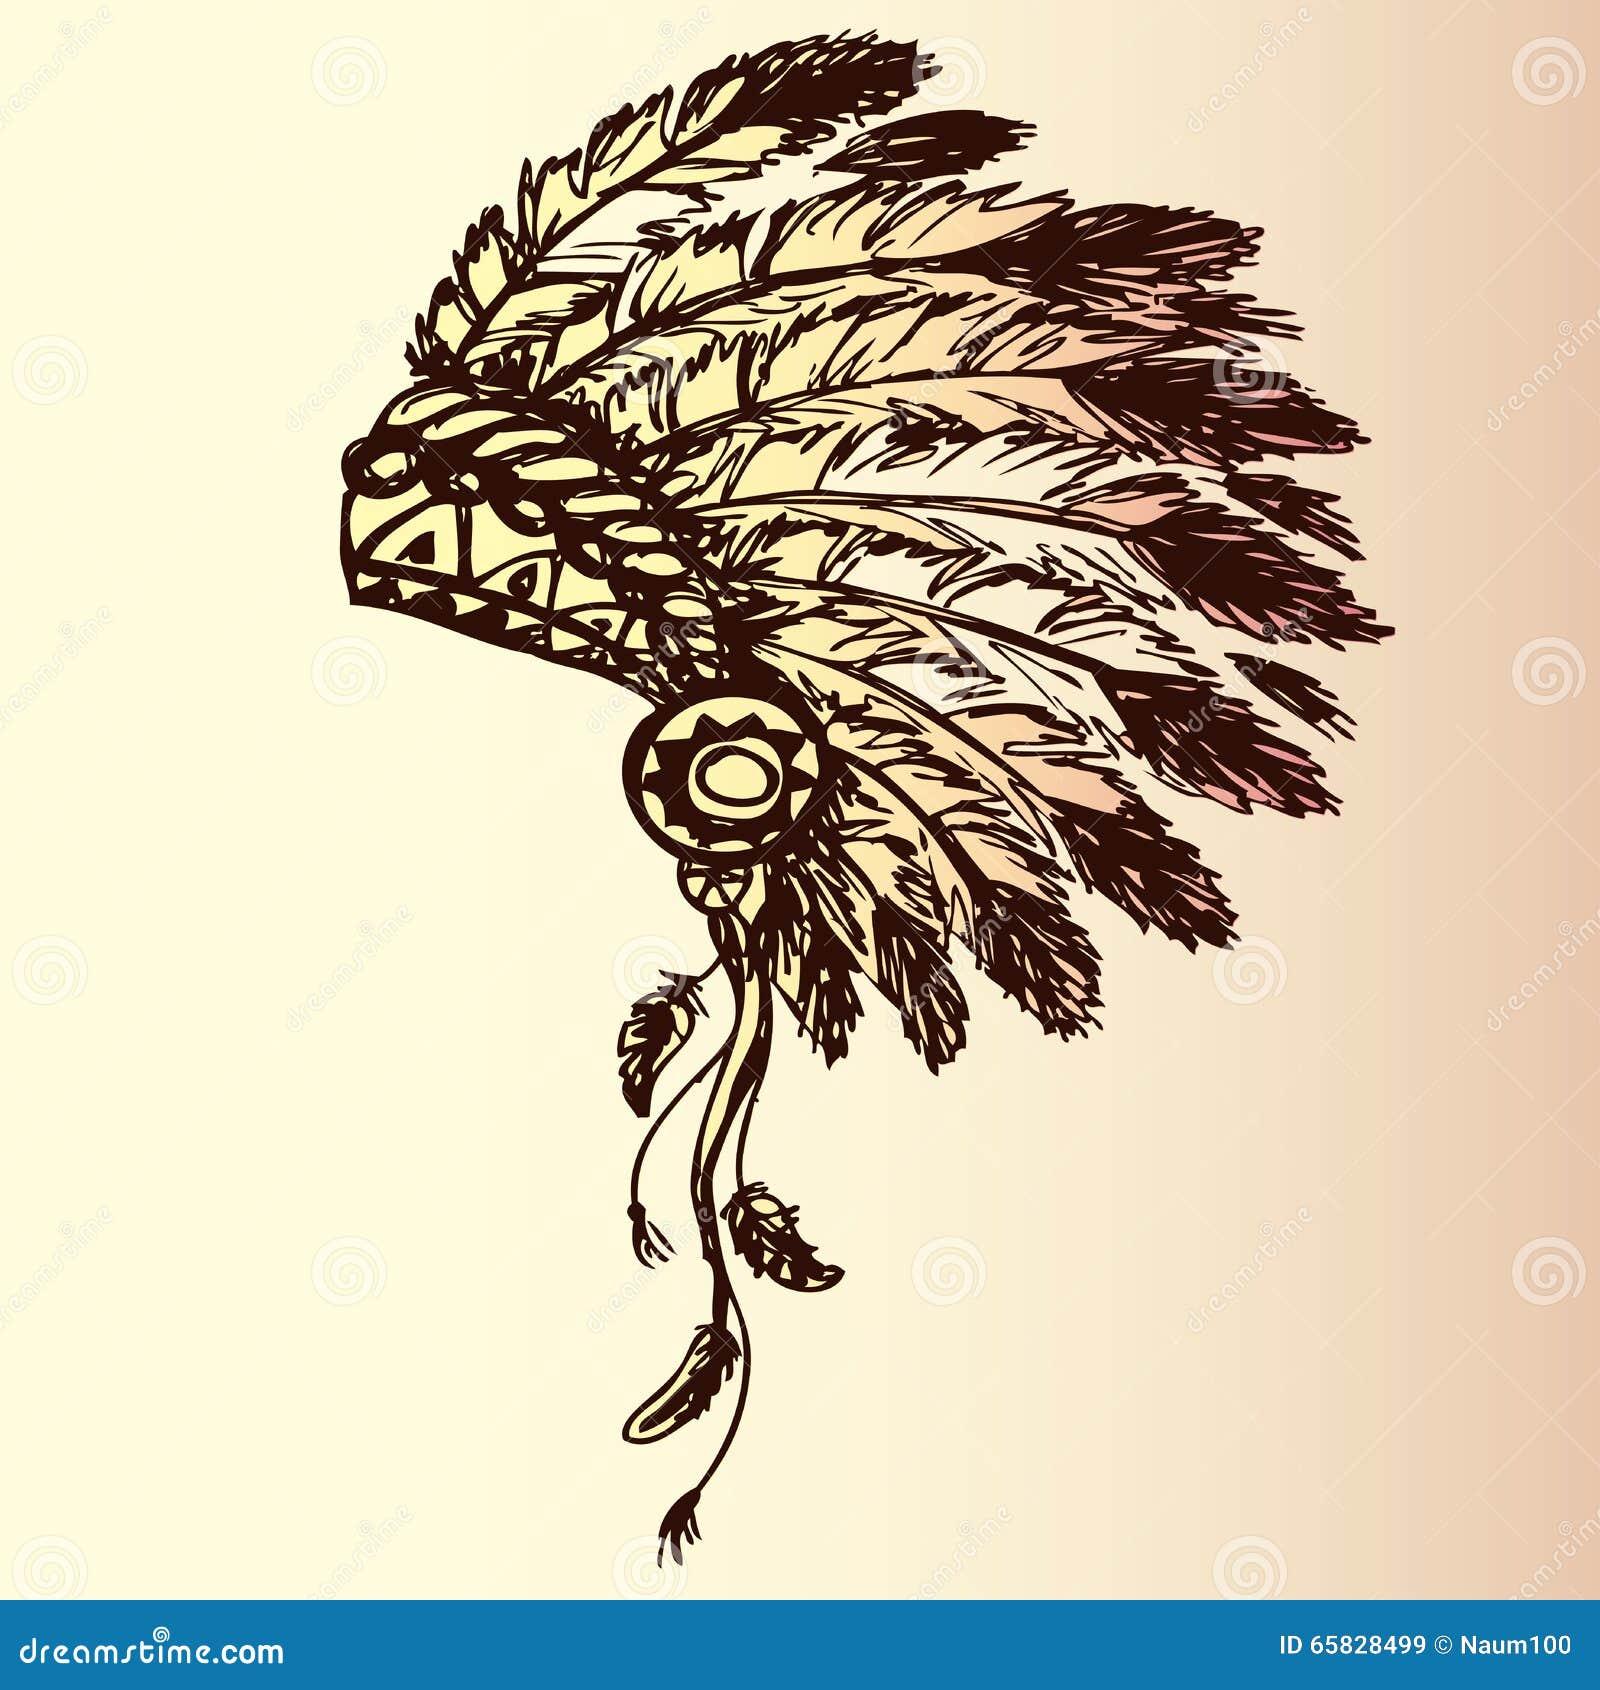 Native American Indian Chief Headdress Stock Vector - Illustration